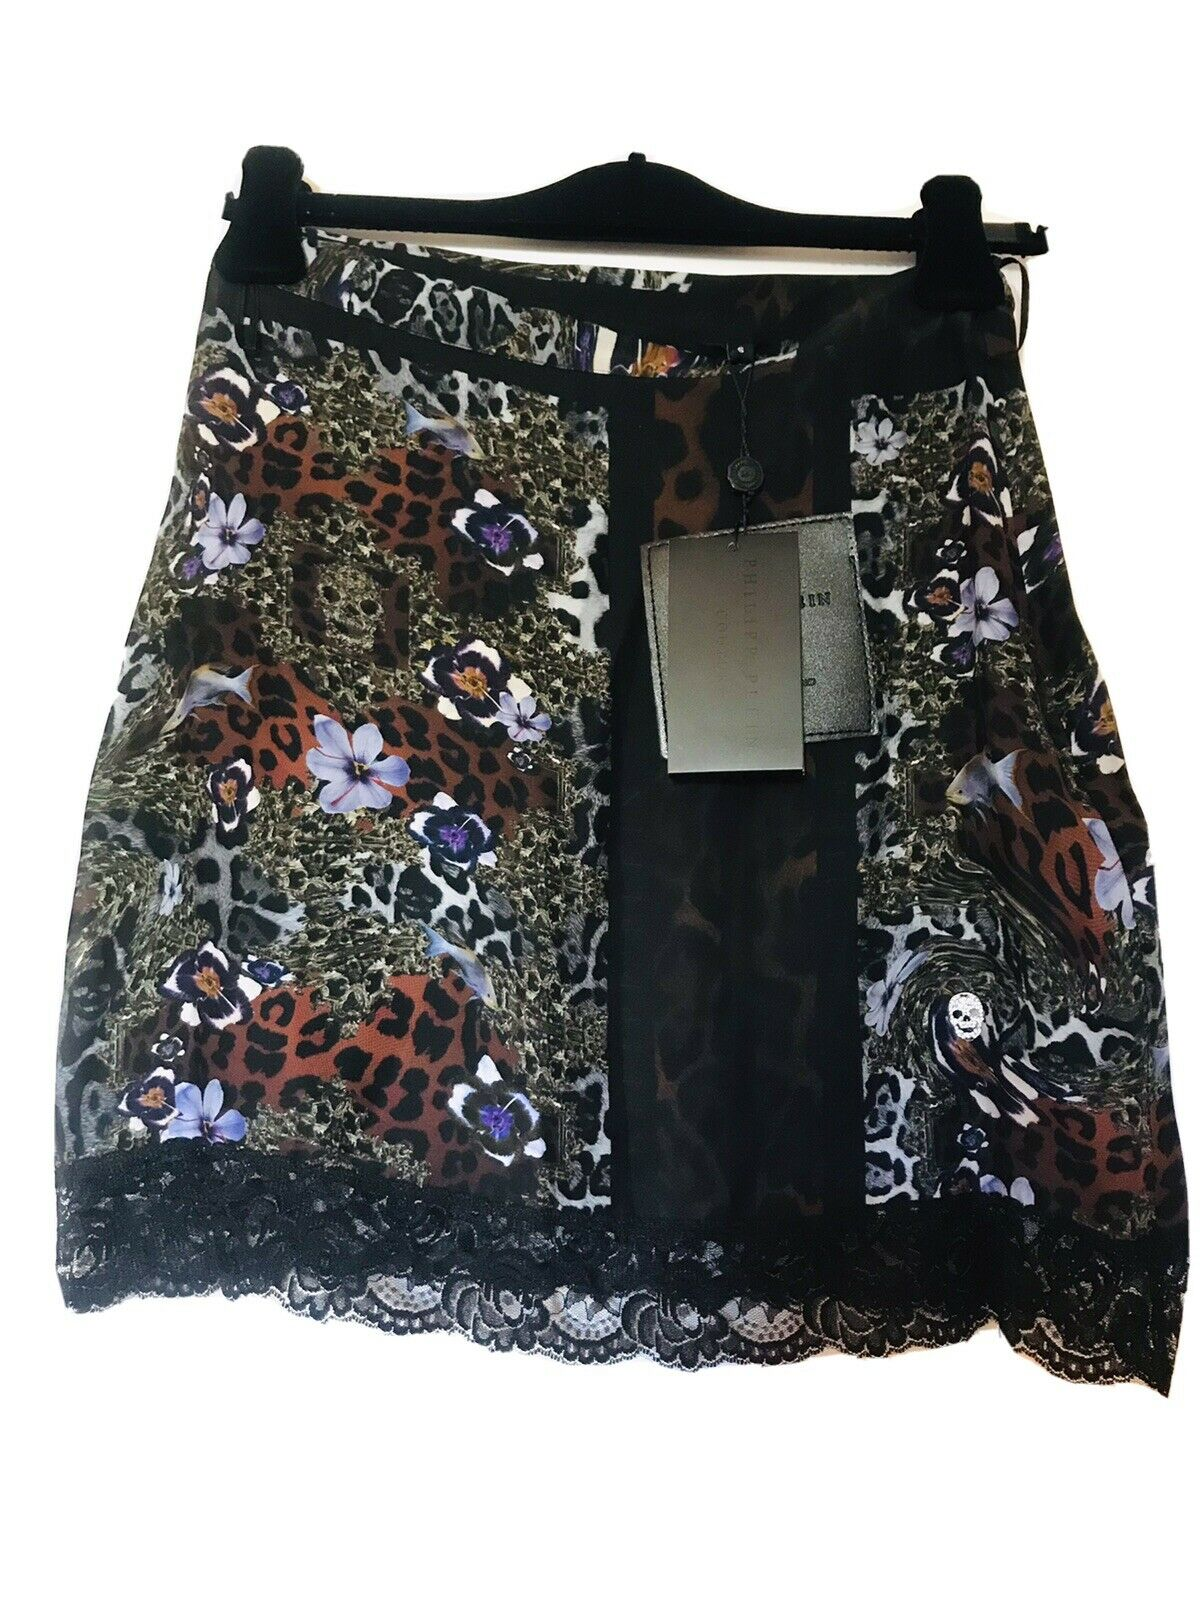 100% Original Philipp Plein SEIDE mini Shirt ,,midnight,, Gr. S Neu!